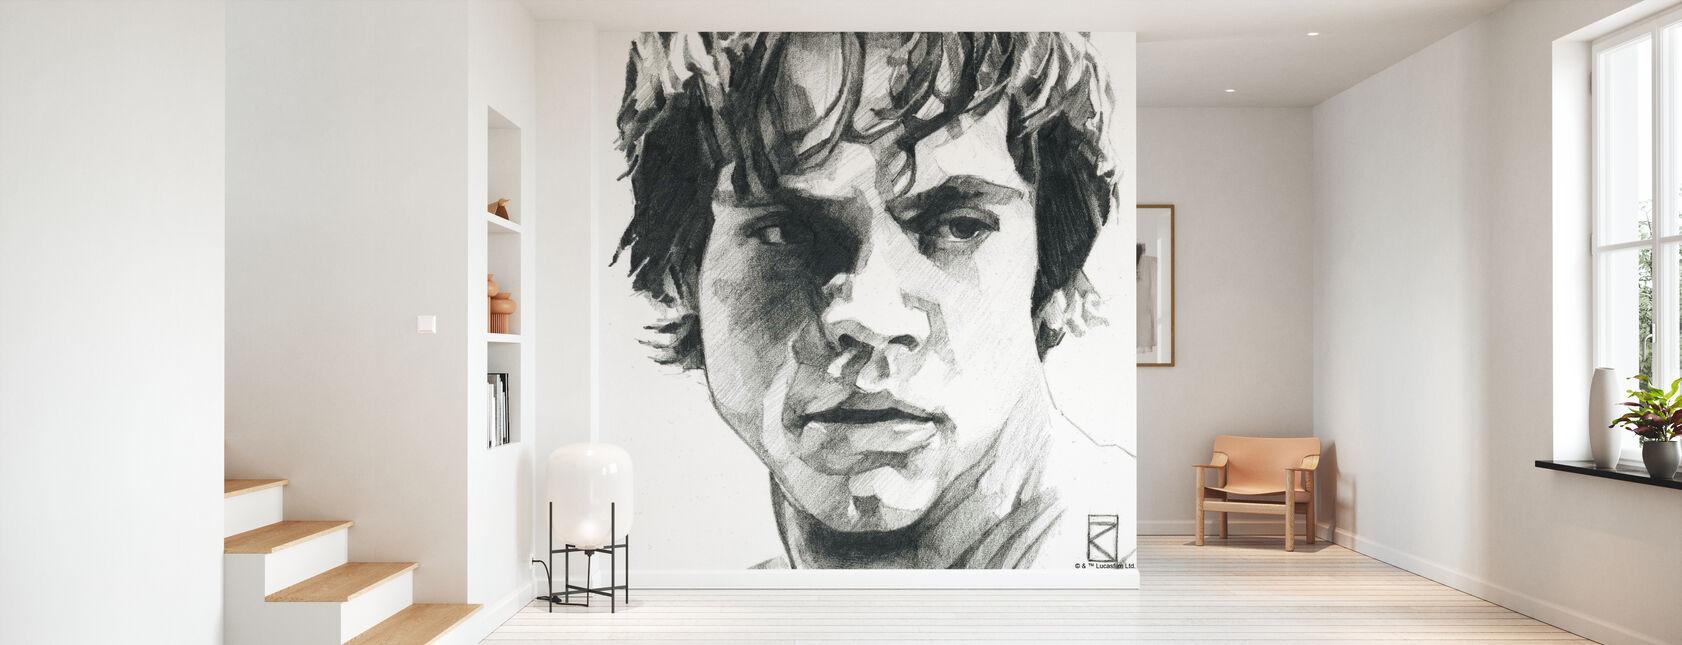 Star Wars - Luke Skywalker, colore: Grafite - Carta da parati - Sala